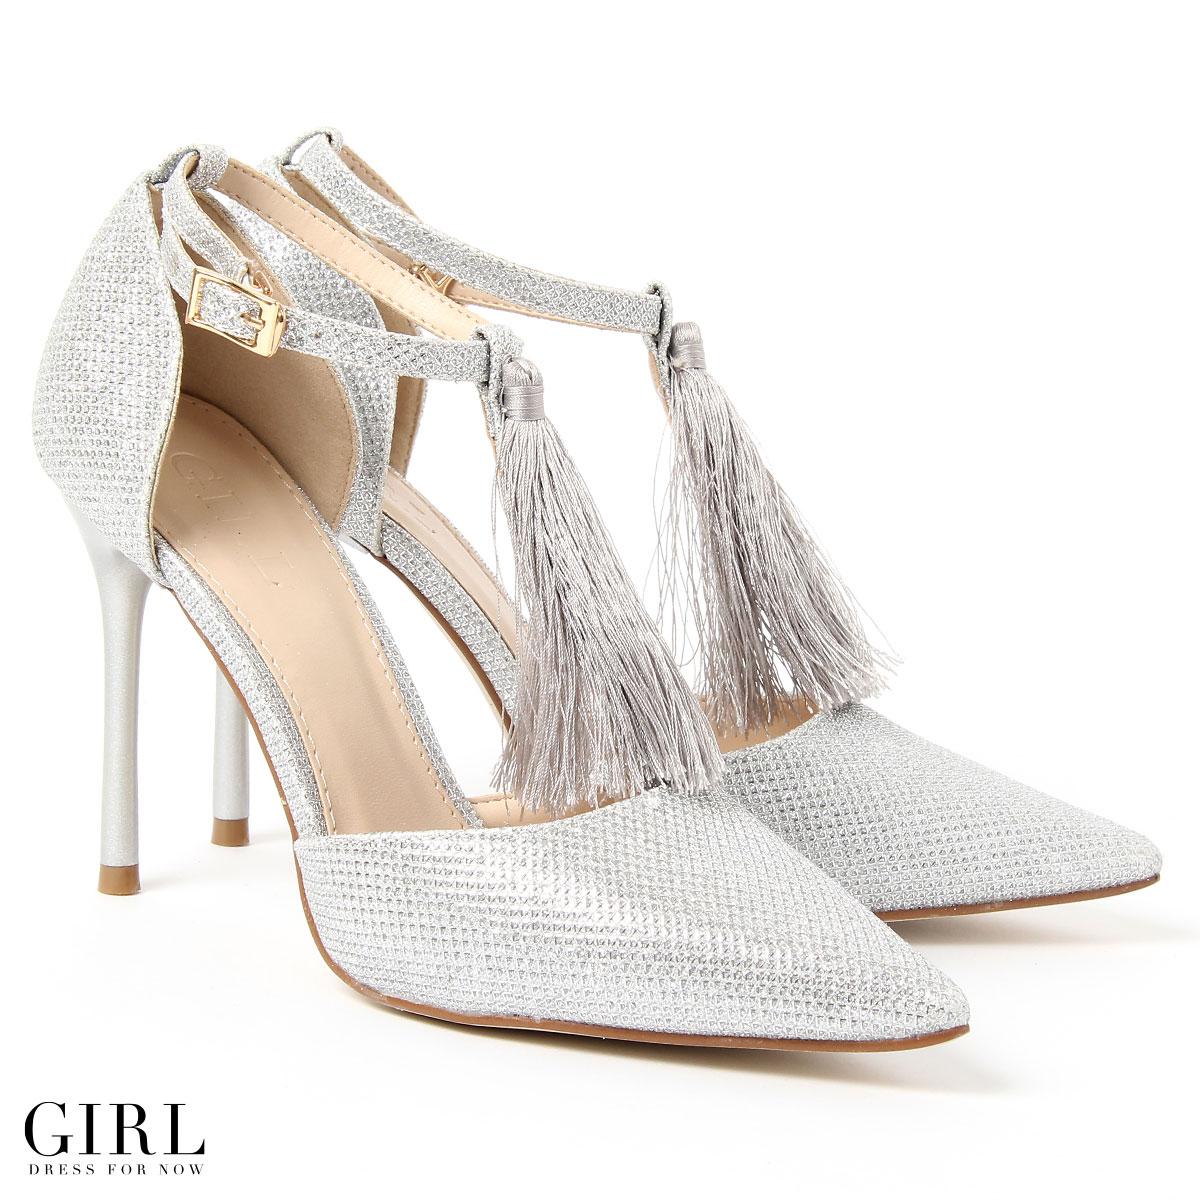 Dress shop GIRL   Rakuten Global Market: Pumps shoes ladies shoes ...